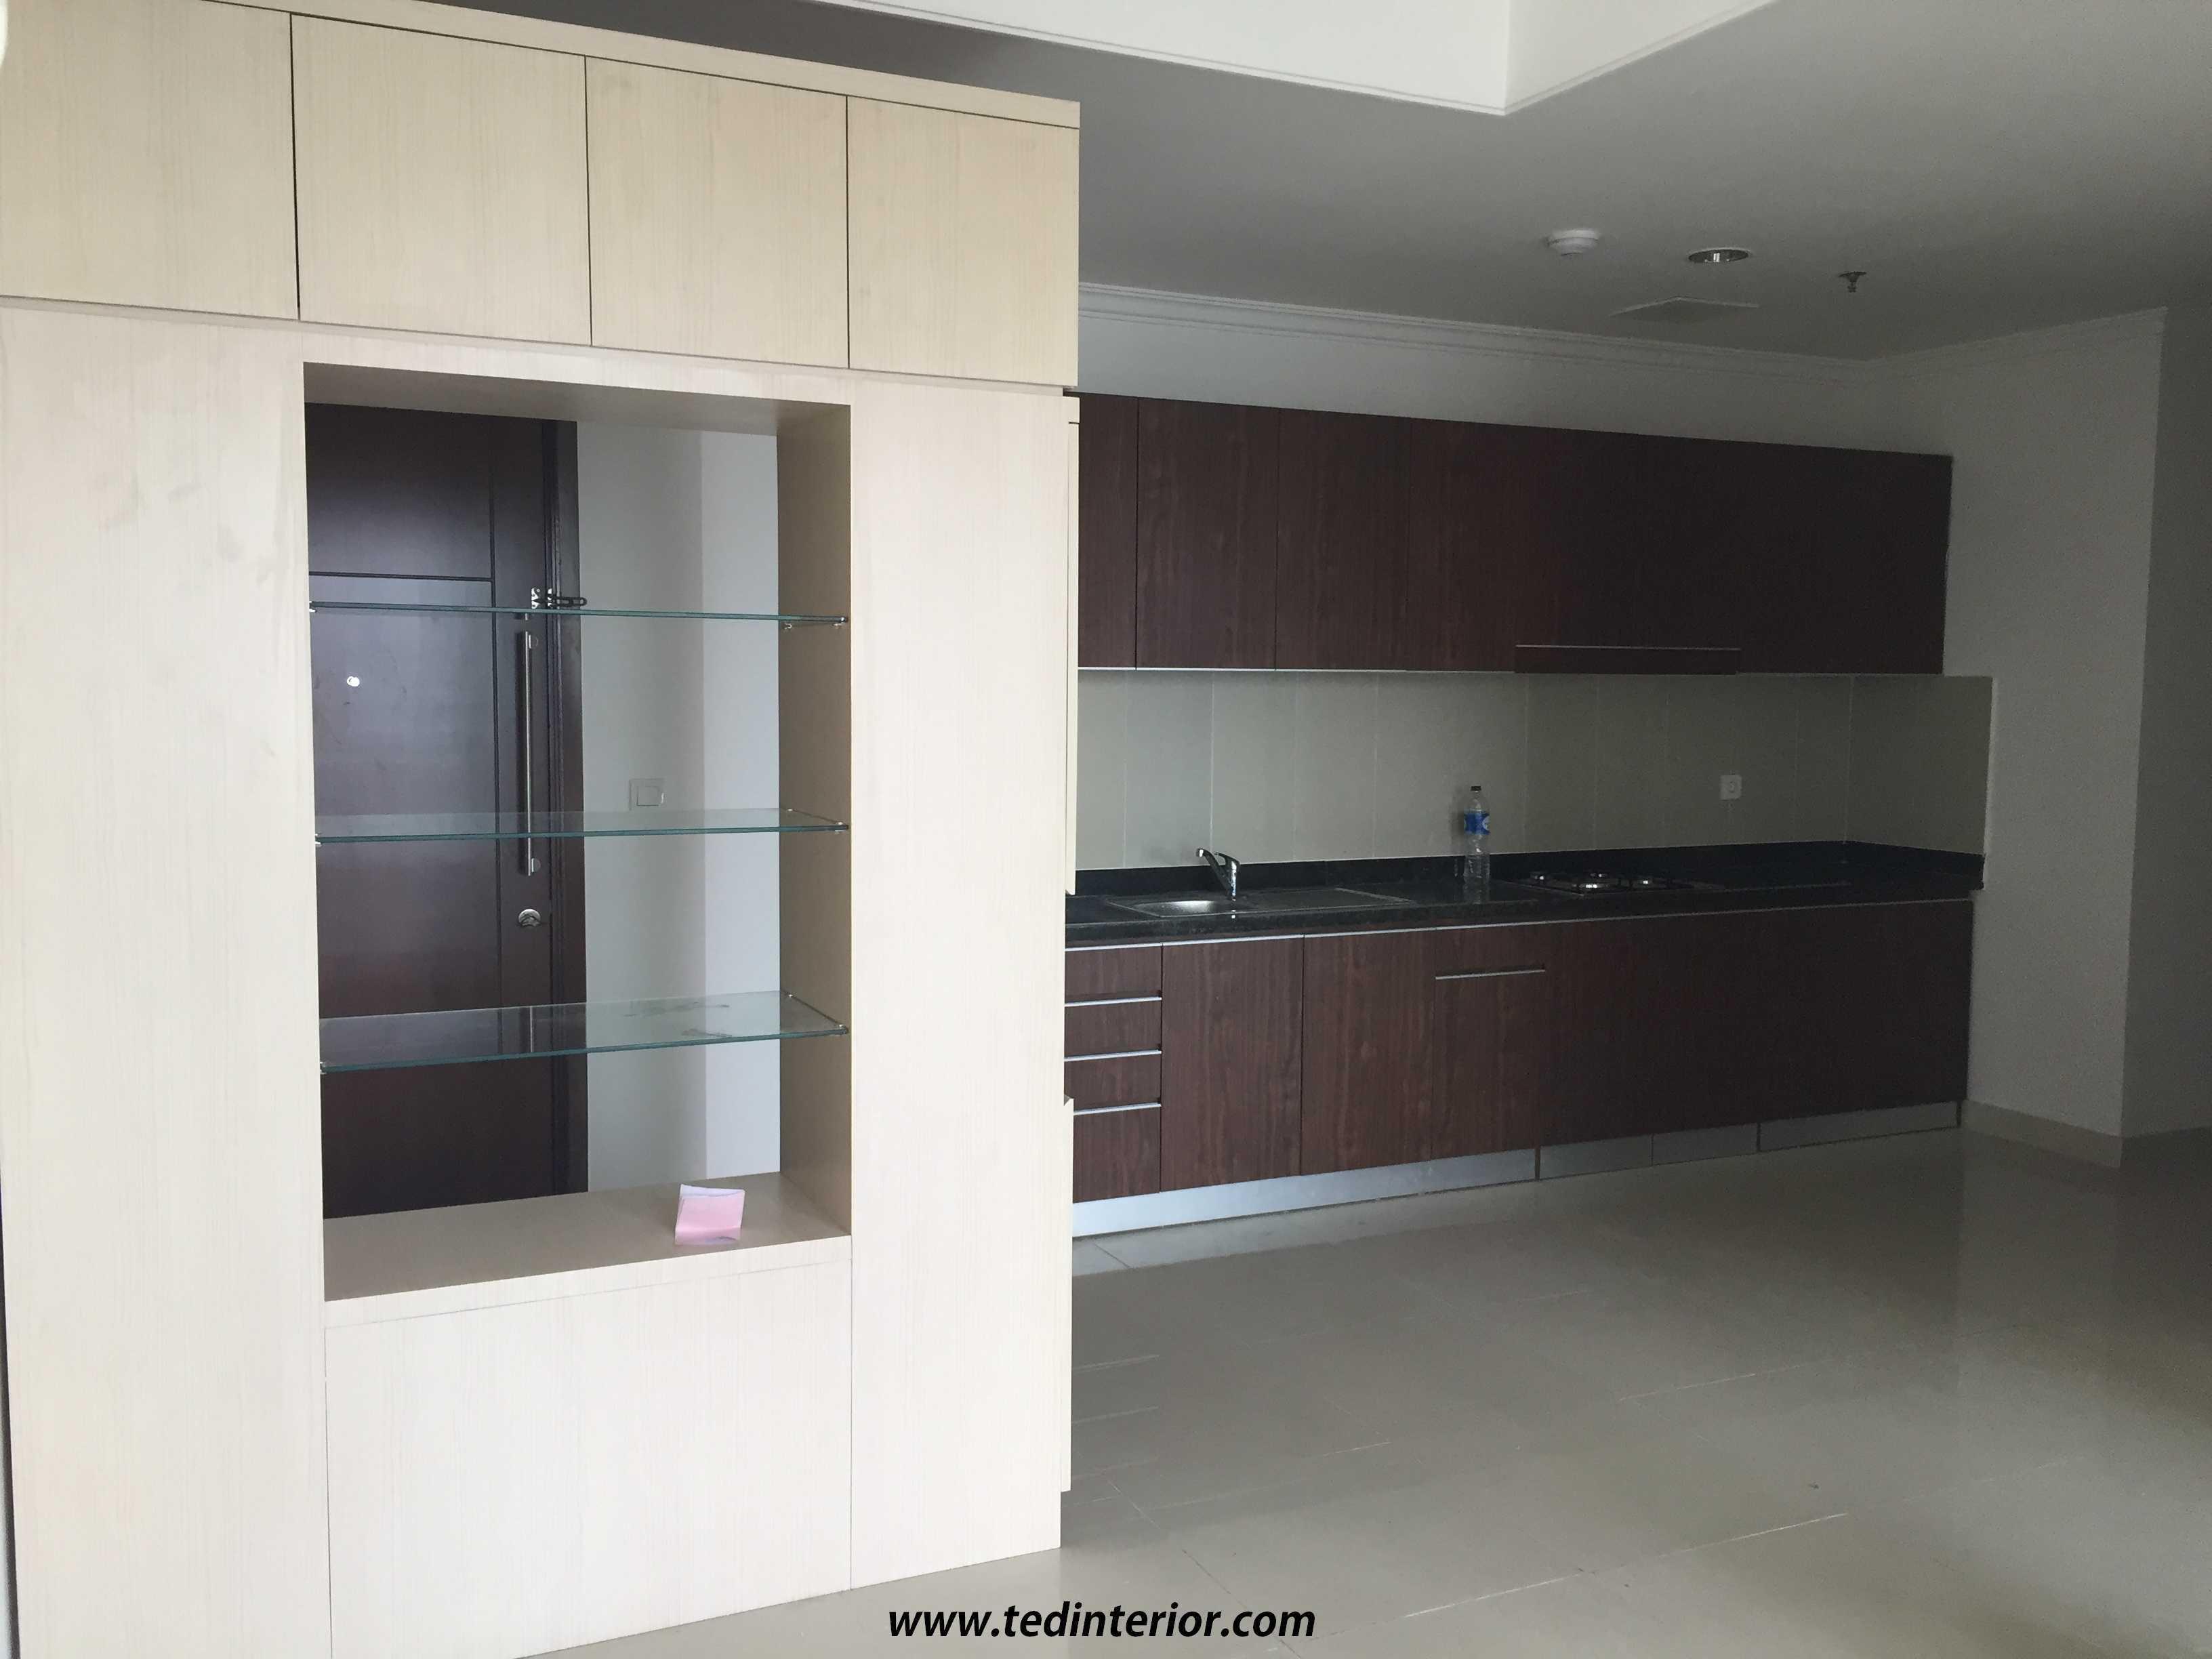 Pd Teguh Desain Indonesia Apartment Kuningan City Jakarta, Indonesia Jakarta, Indonesia Living-Room-1 Modern  34860